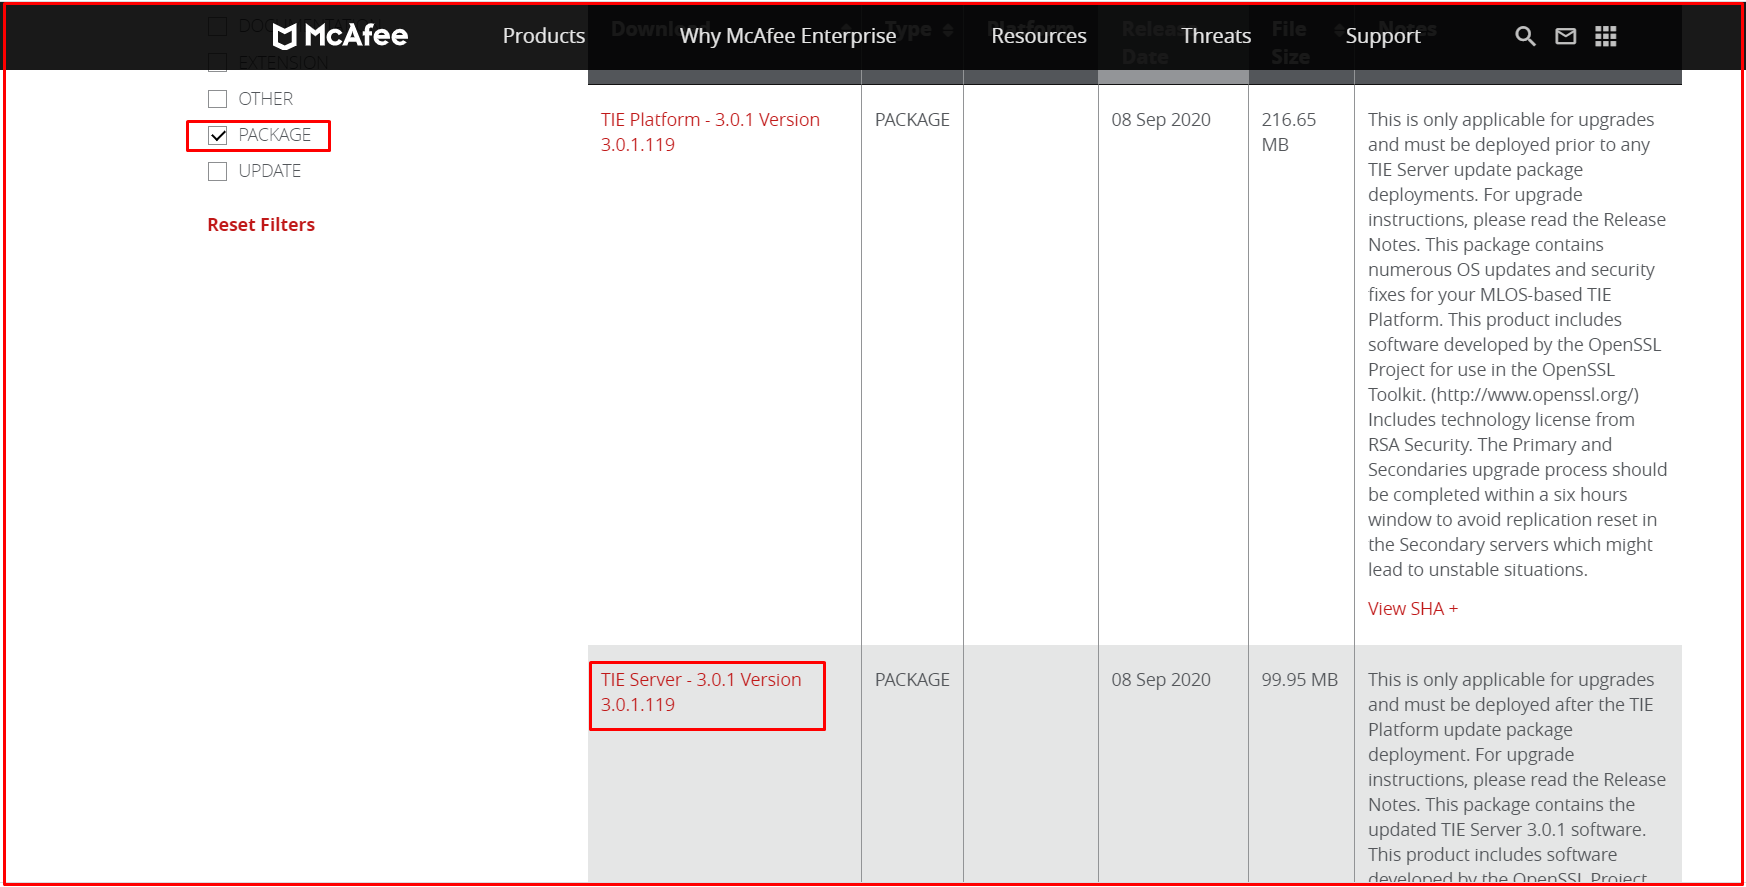 TIE Server - 3.0.1.119 Version